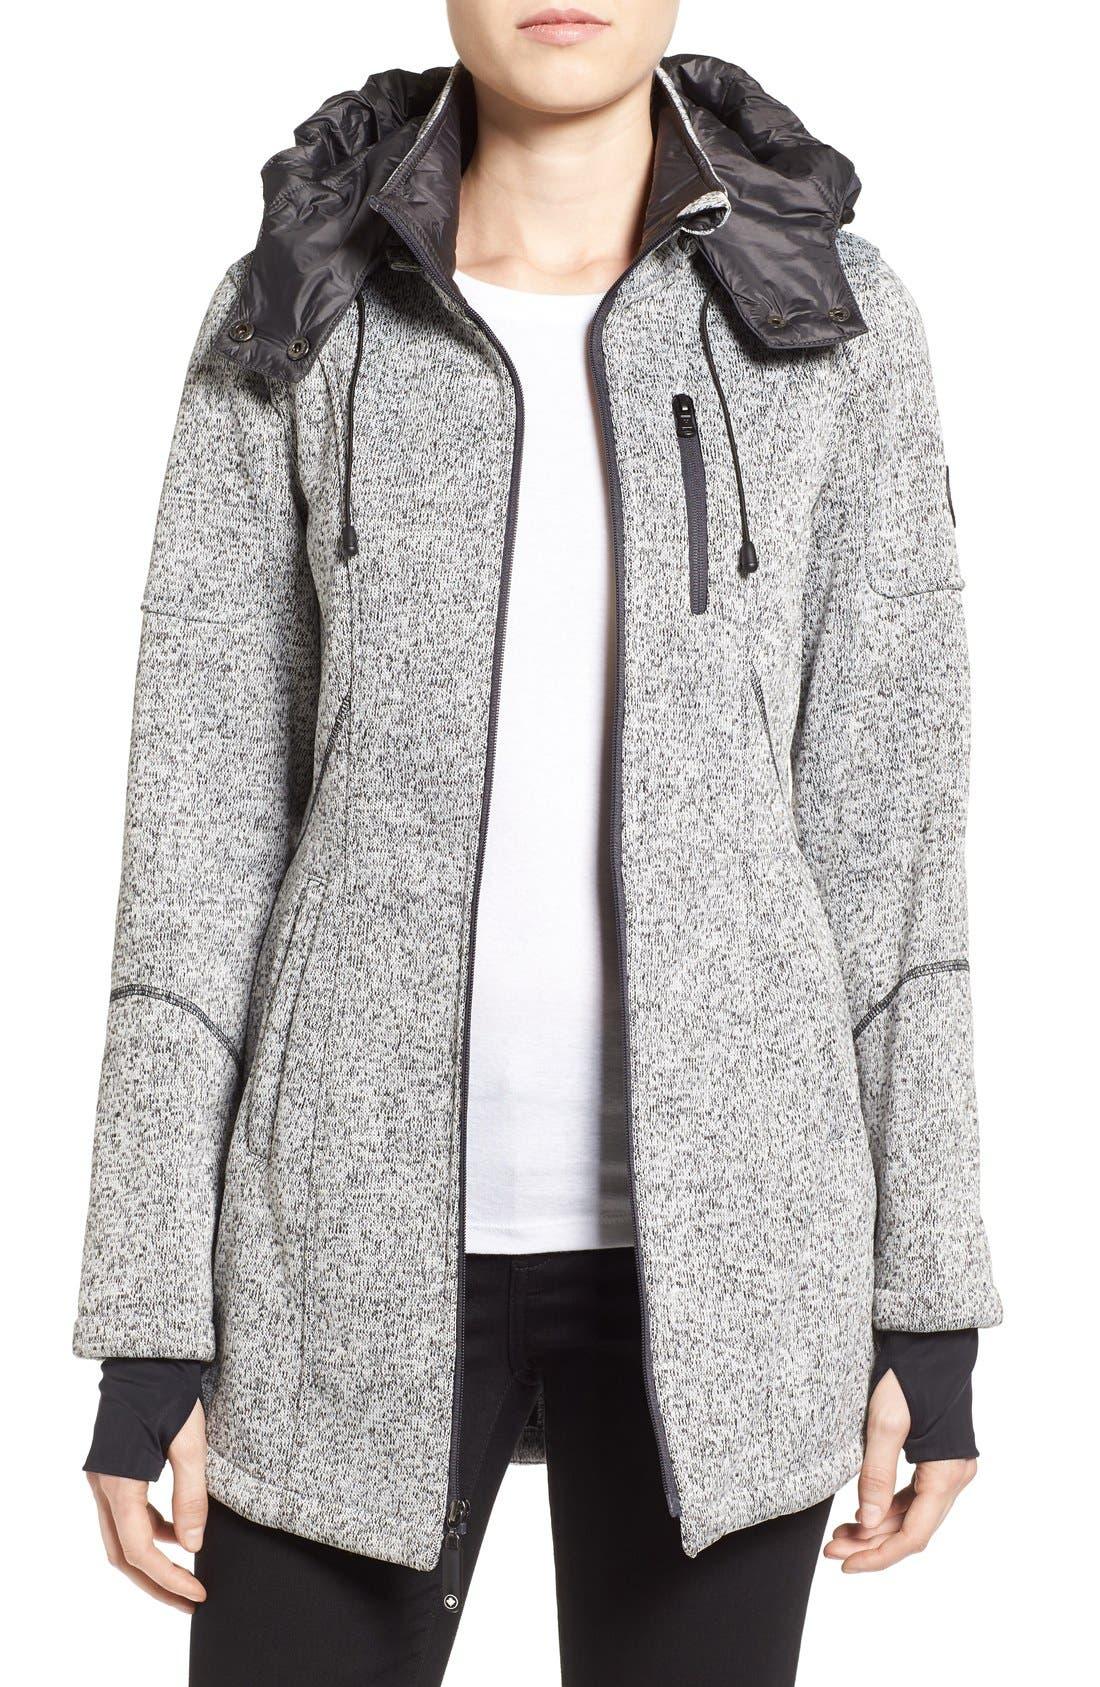 Halifax Bonded Knit Zip Front Jacket